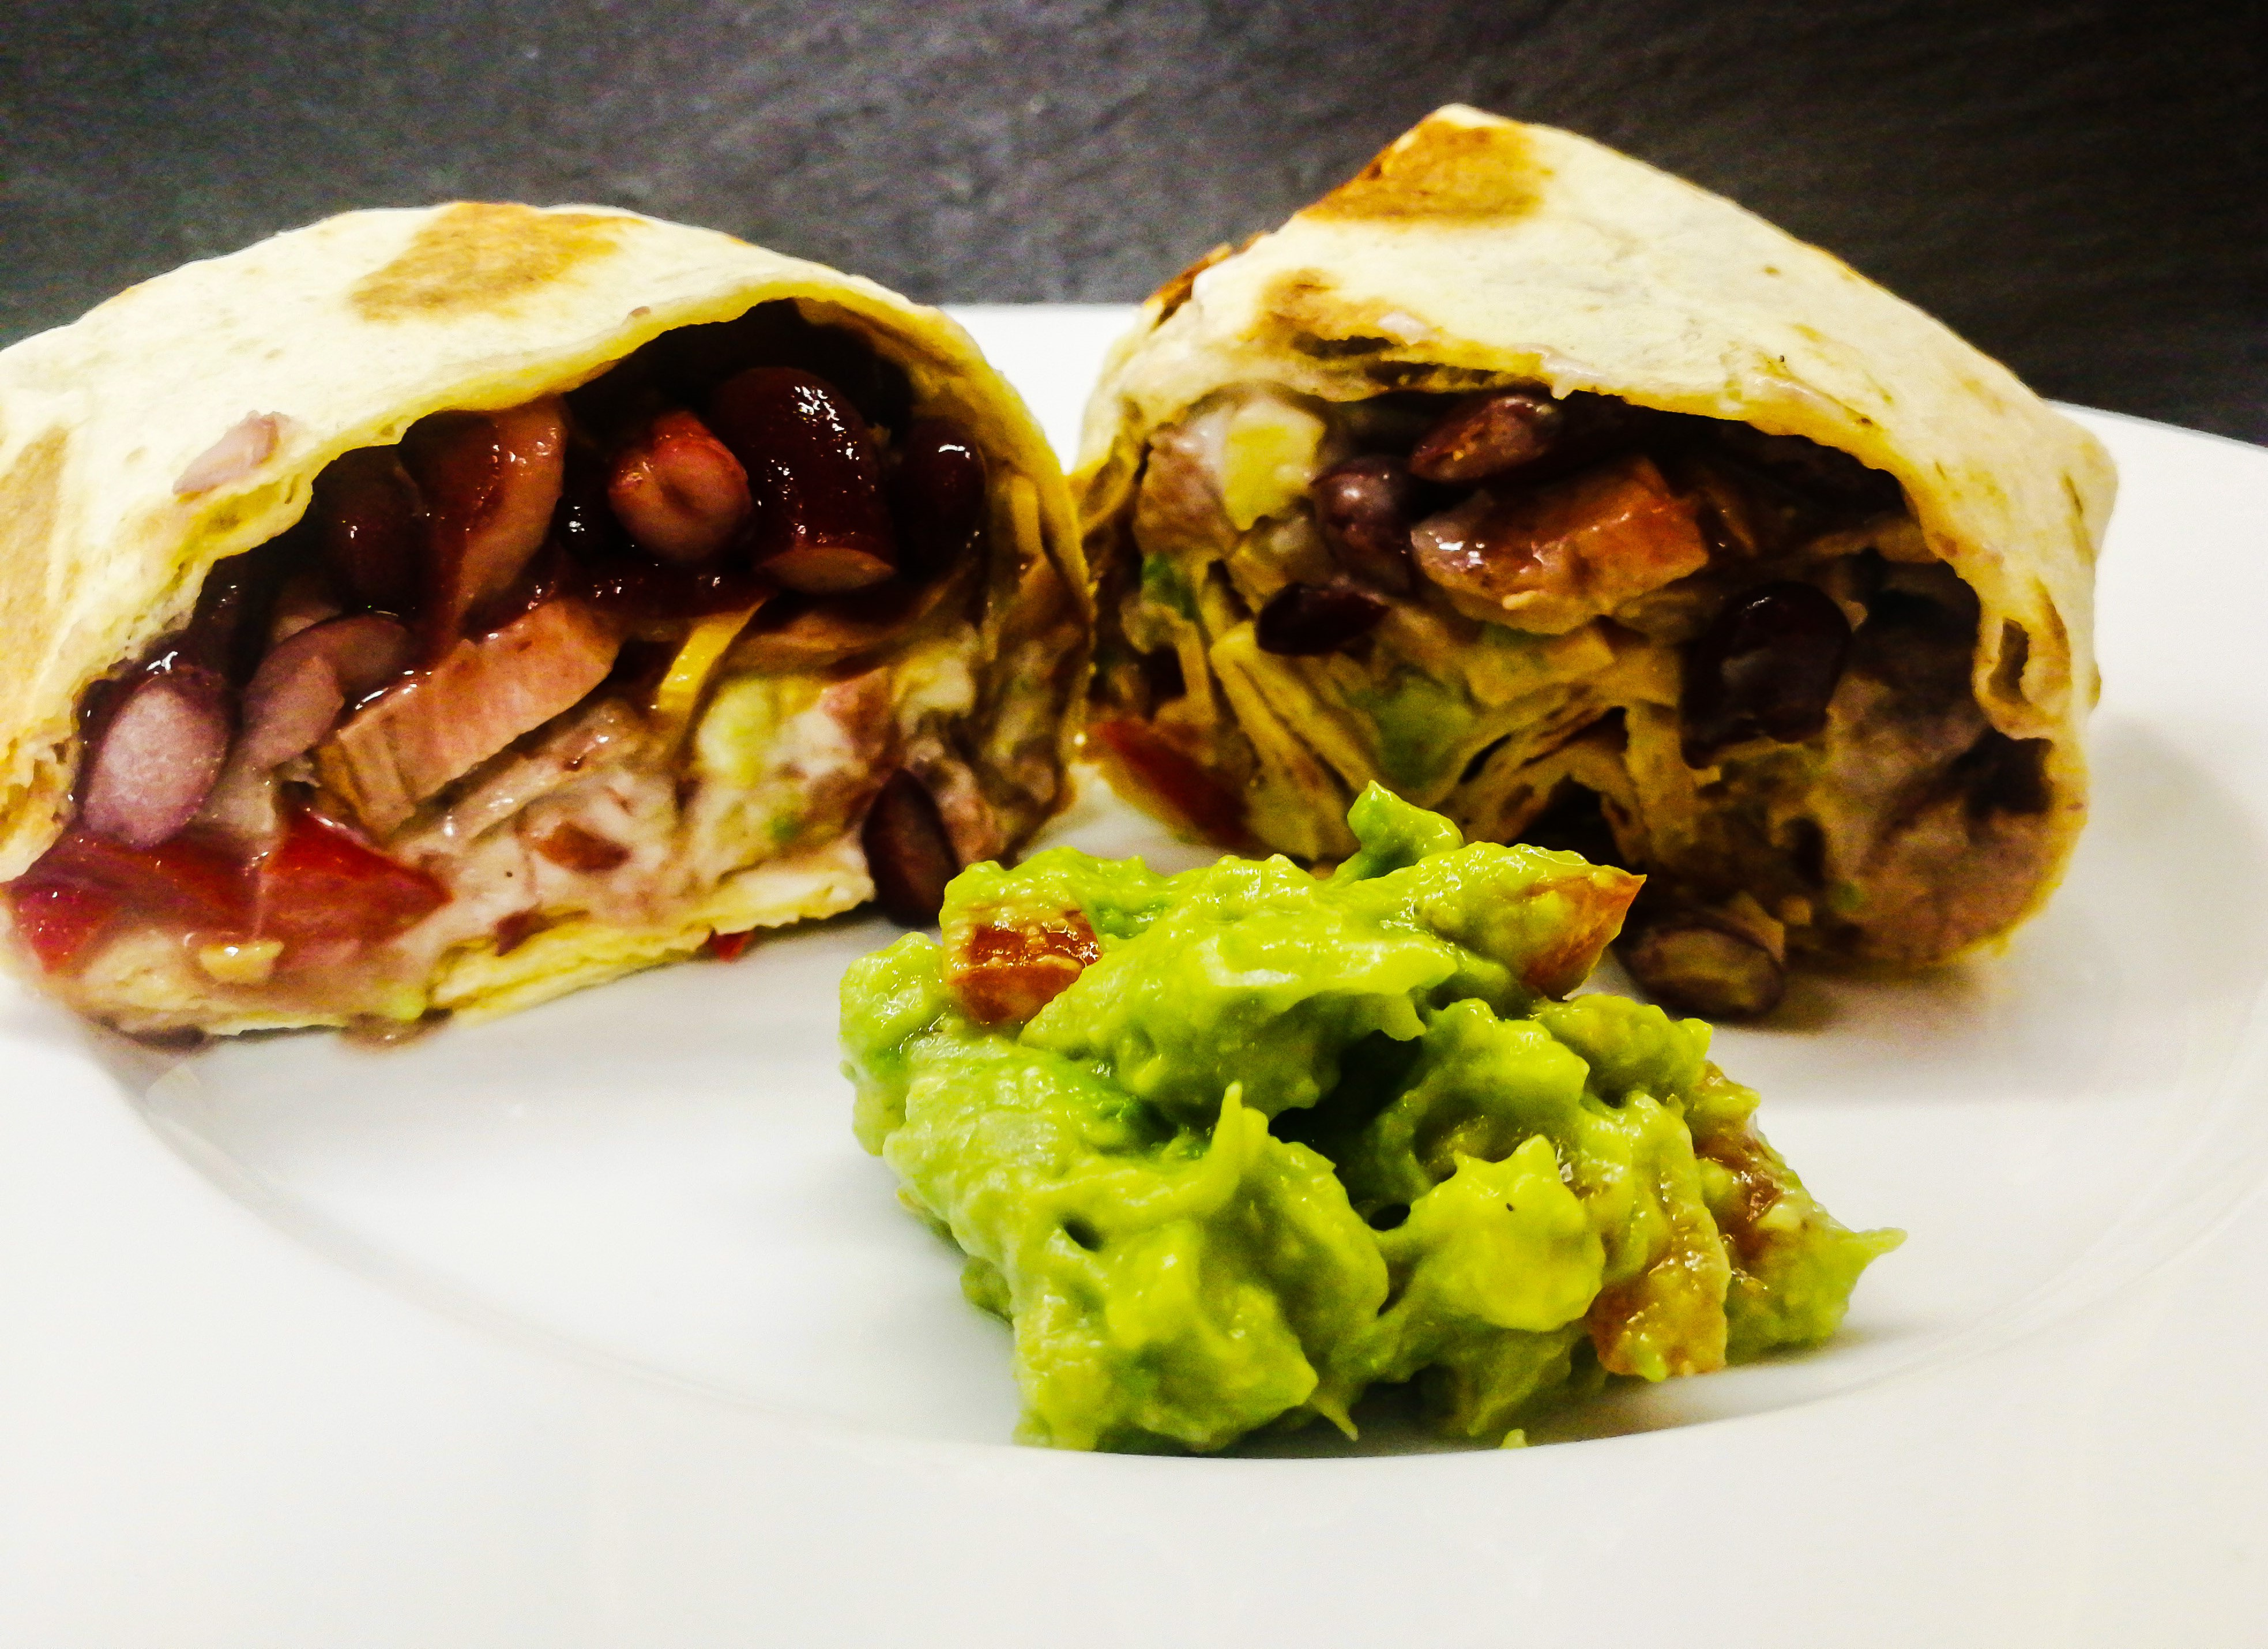 Mexické burrito s hovězím masem